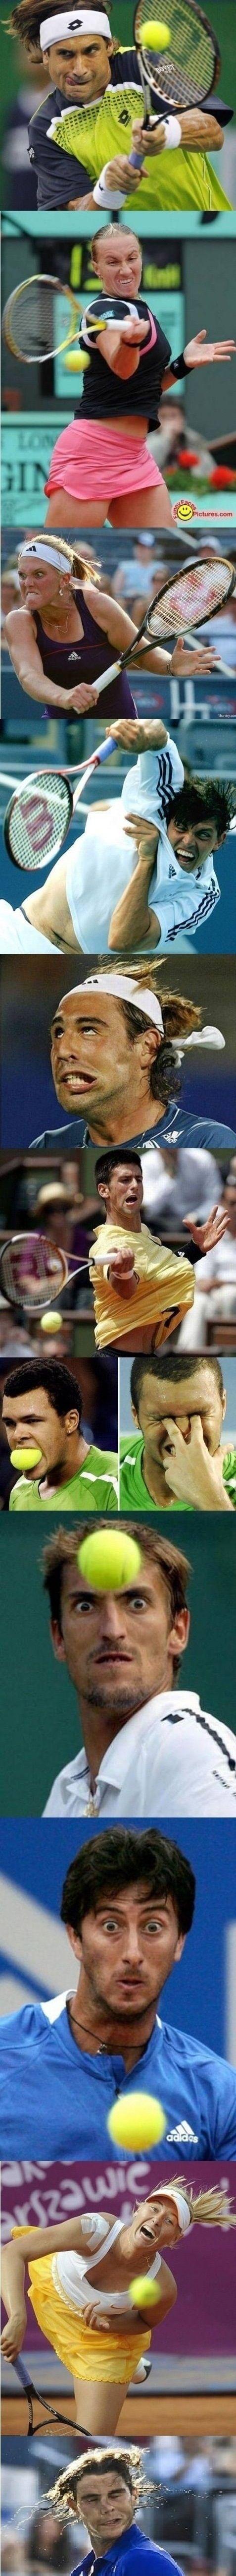 tennis:/ more entertaining than ever!!!